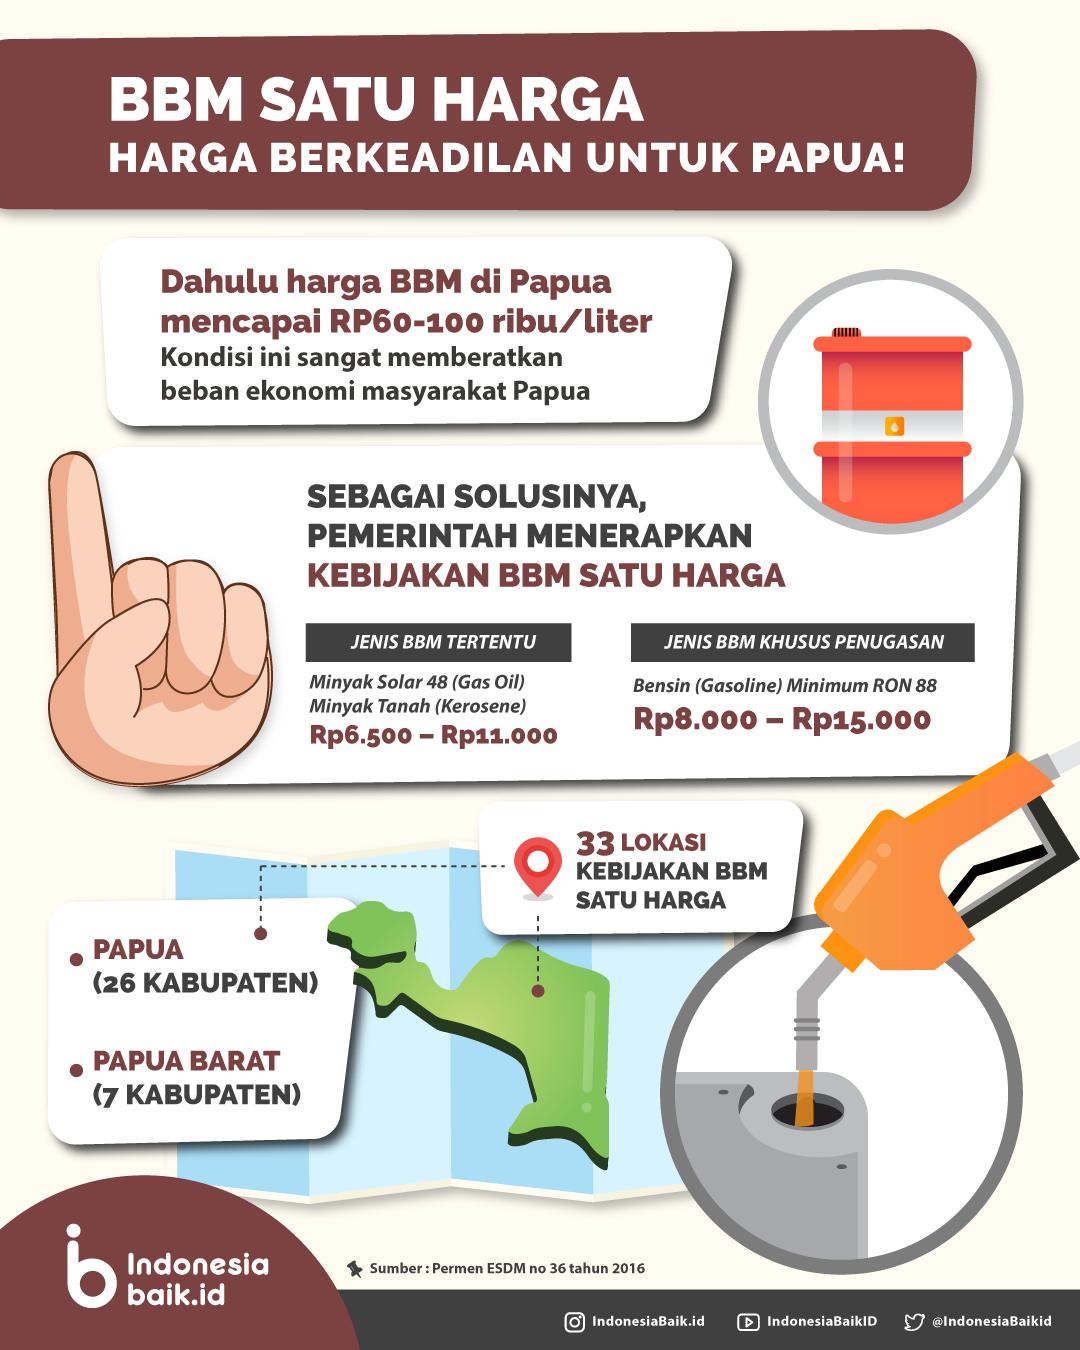 BBM Satu Harga di Papua Indonesia Baik Infografis